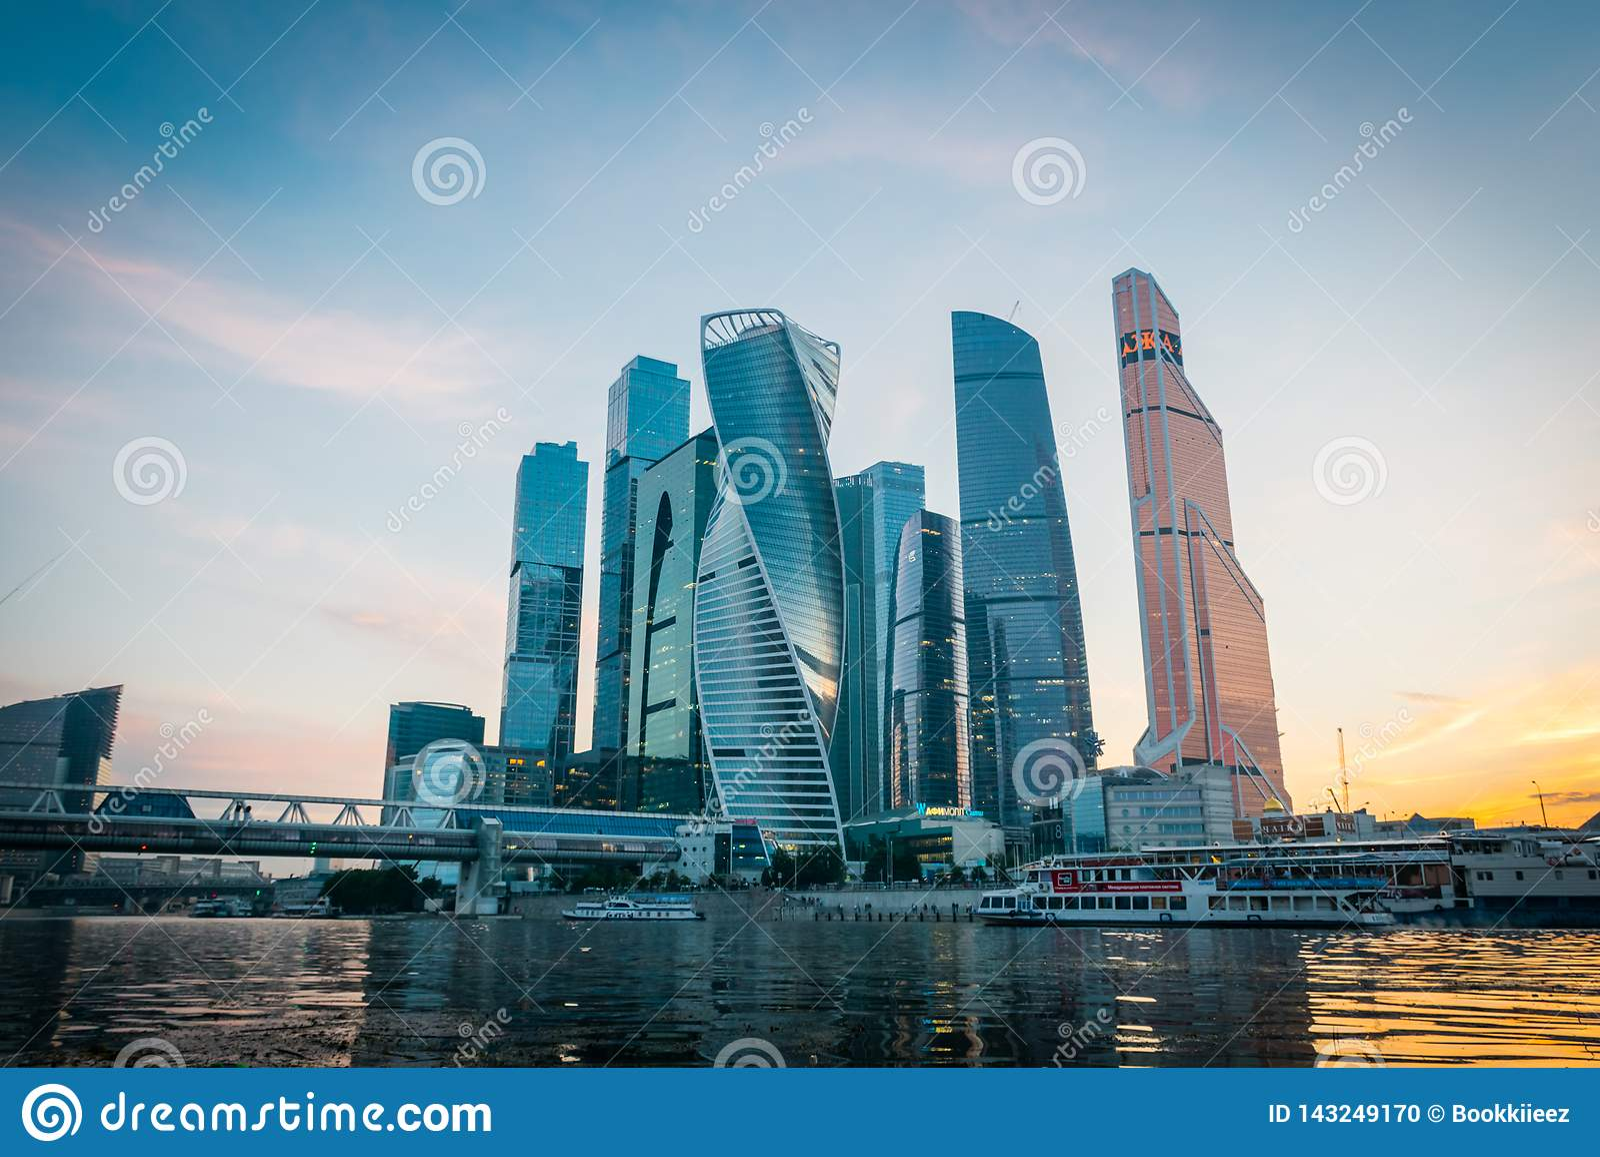 Commercieel van Moskou Internationaal Centrum in Moskou, Rusland